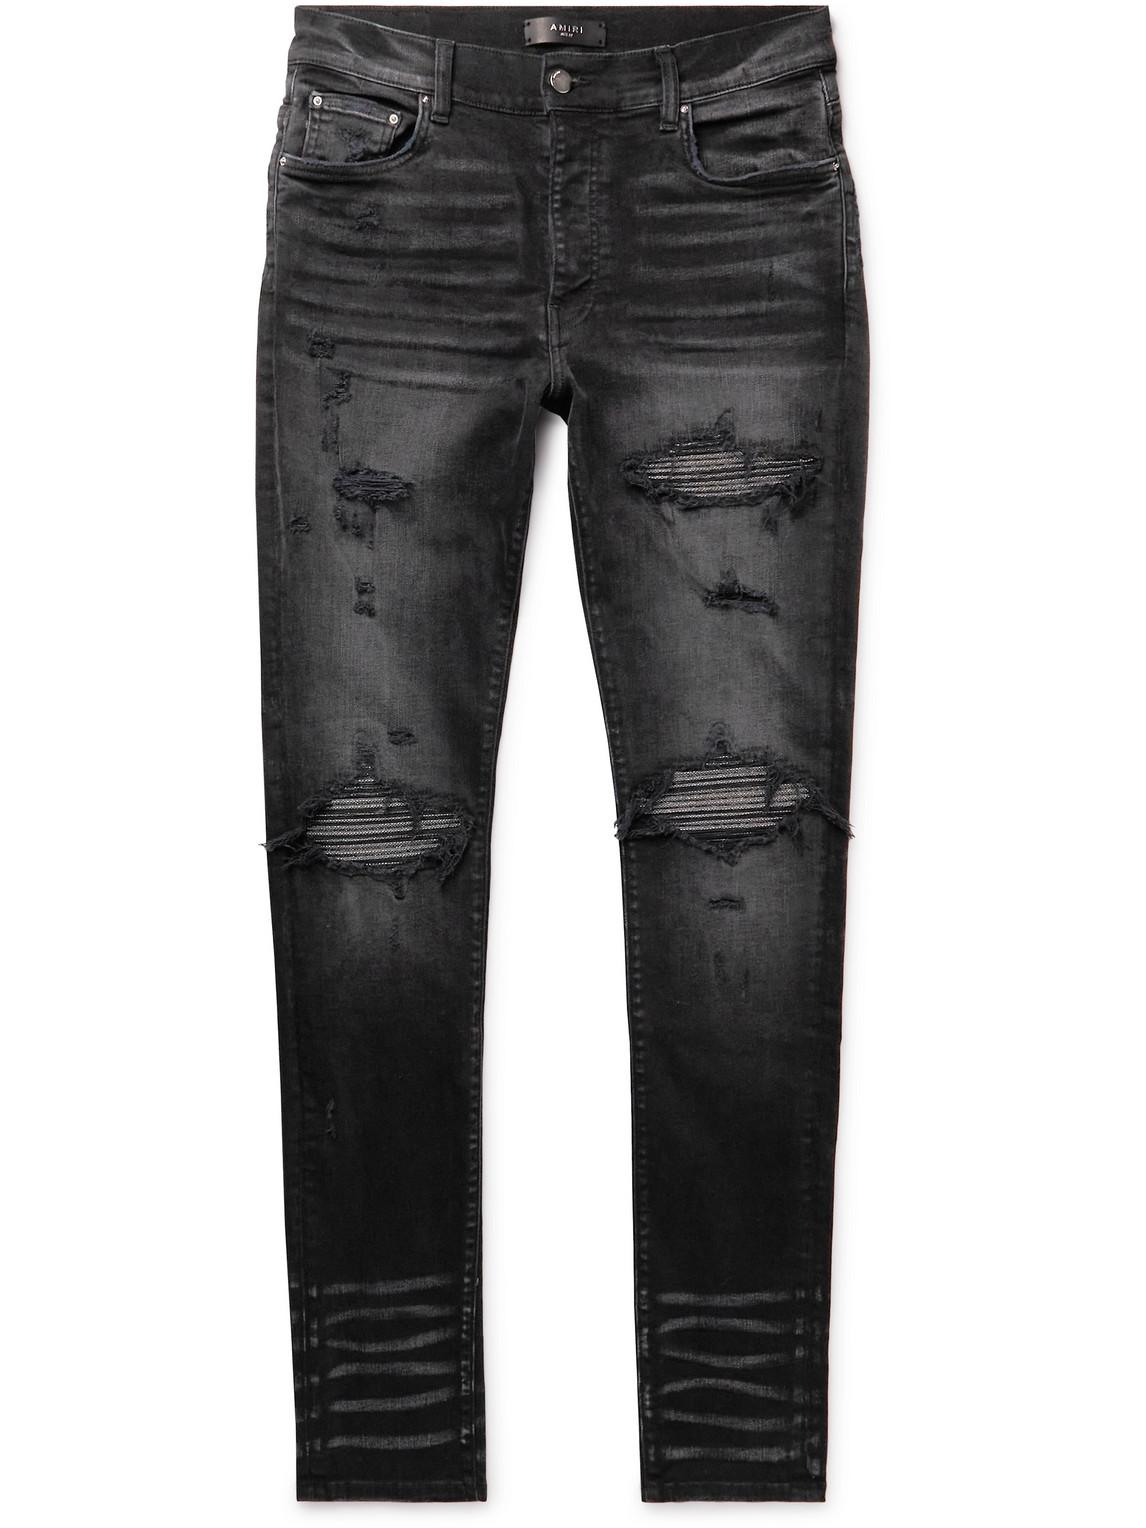 MX1 Skinny-Fit Distressed Stretch-Denim Jeans